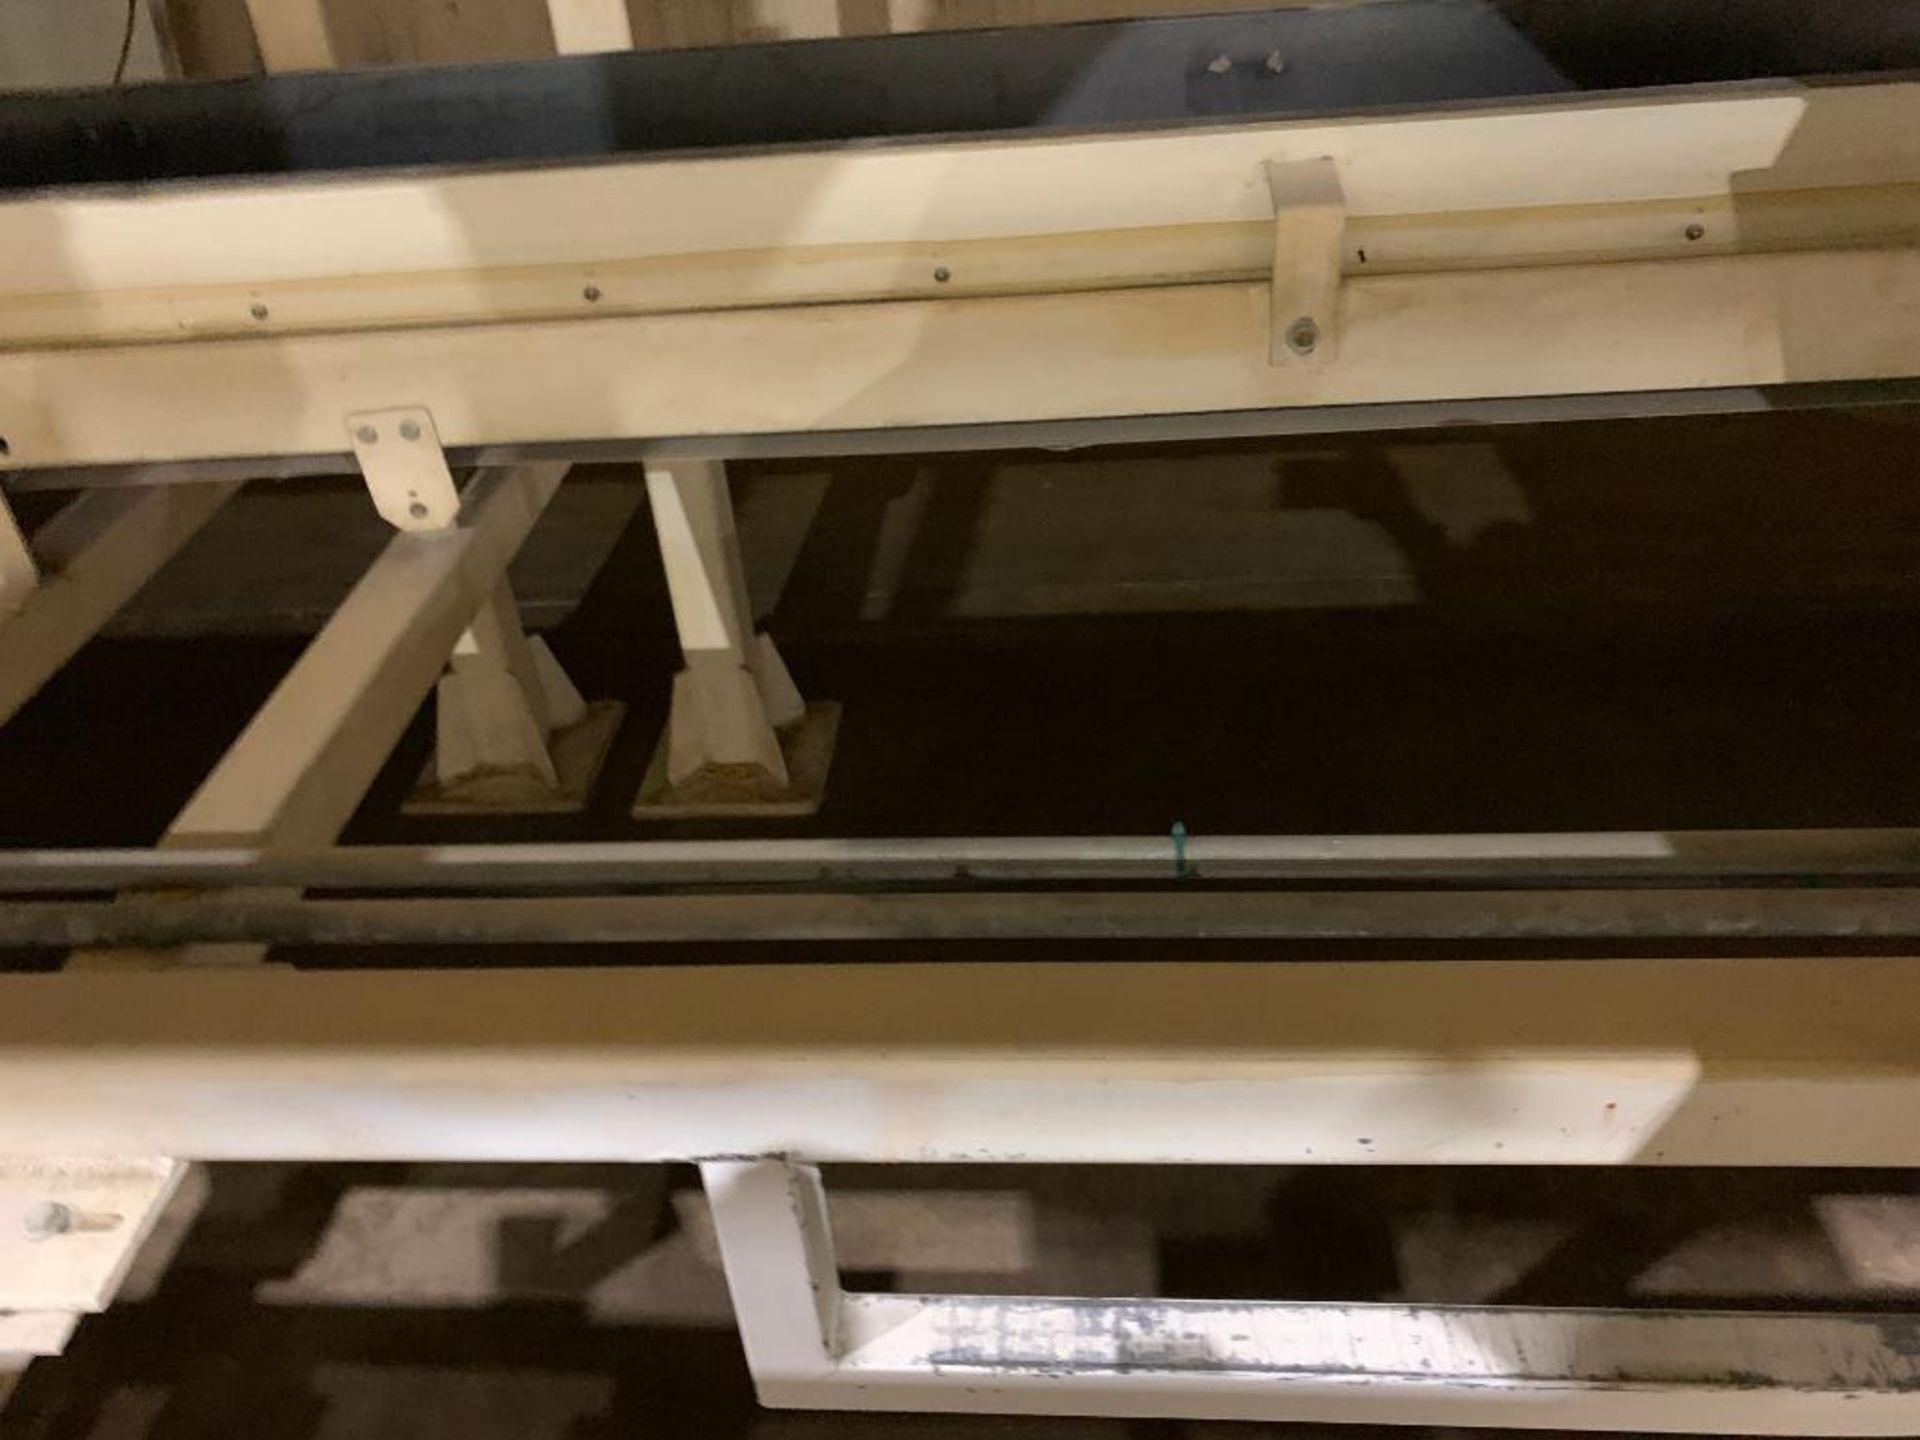 Aseeco mild steel cone bottom bulk storage bin - Image 15 of 25